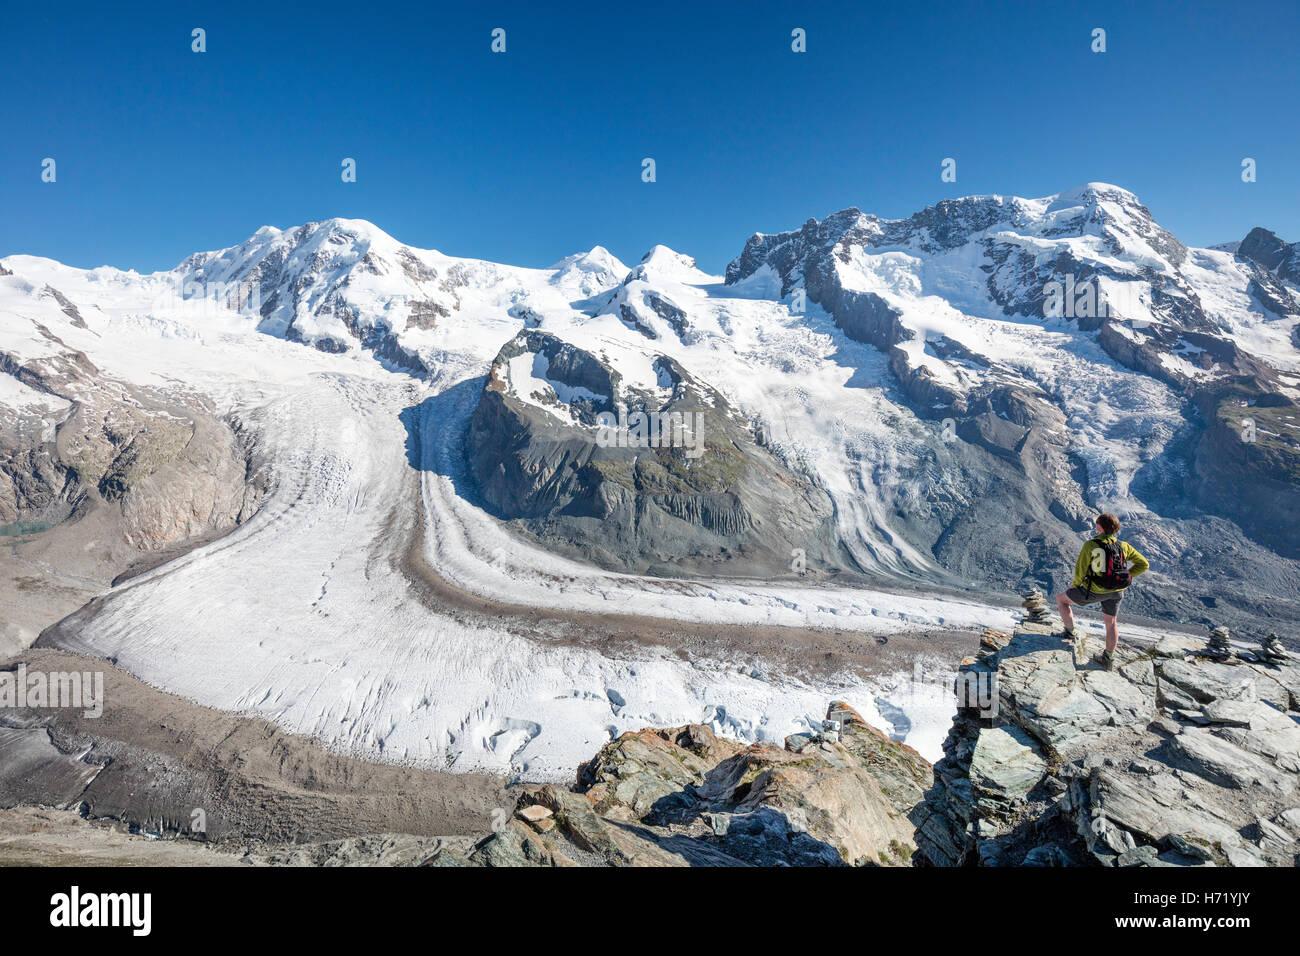 Hiker looking over Gorner Glacier and Monte Rosa from Gornergrat. Zermatt, Pennine Alps, Valais, Switzerland. - Stock Image